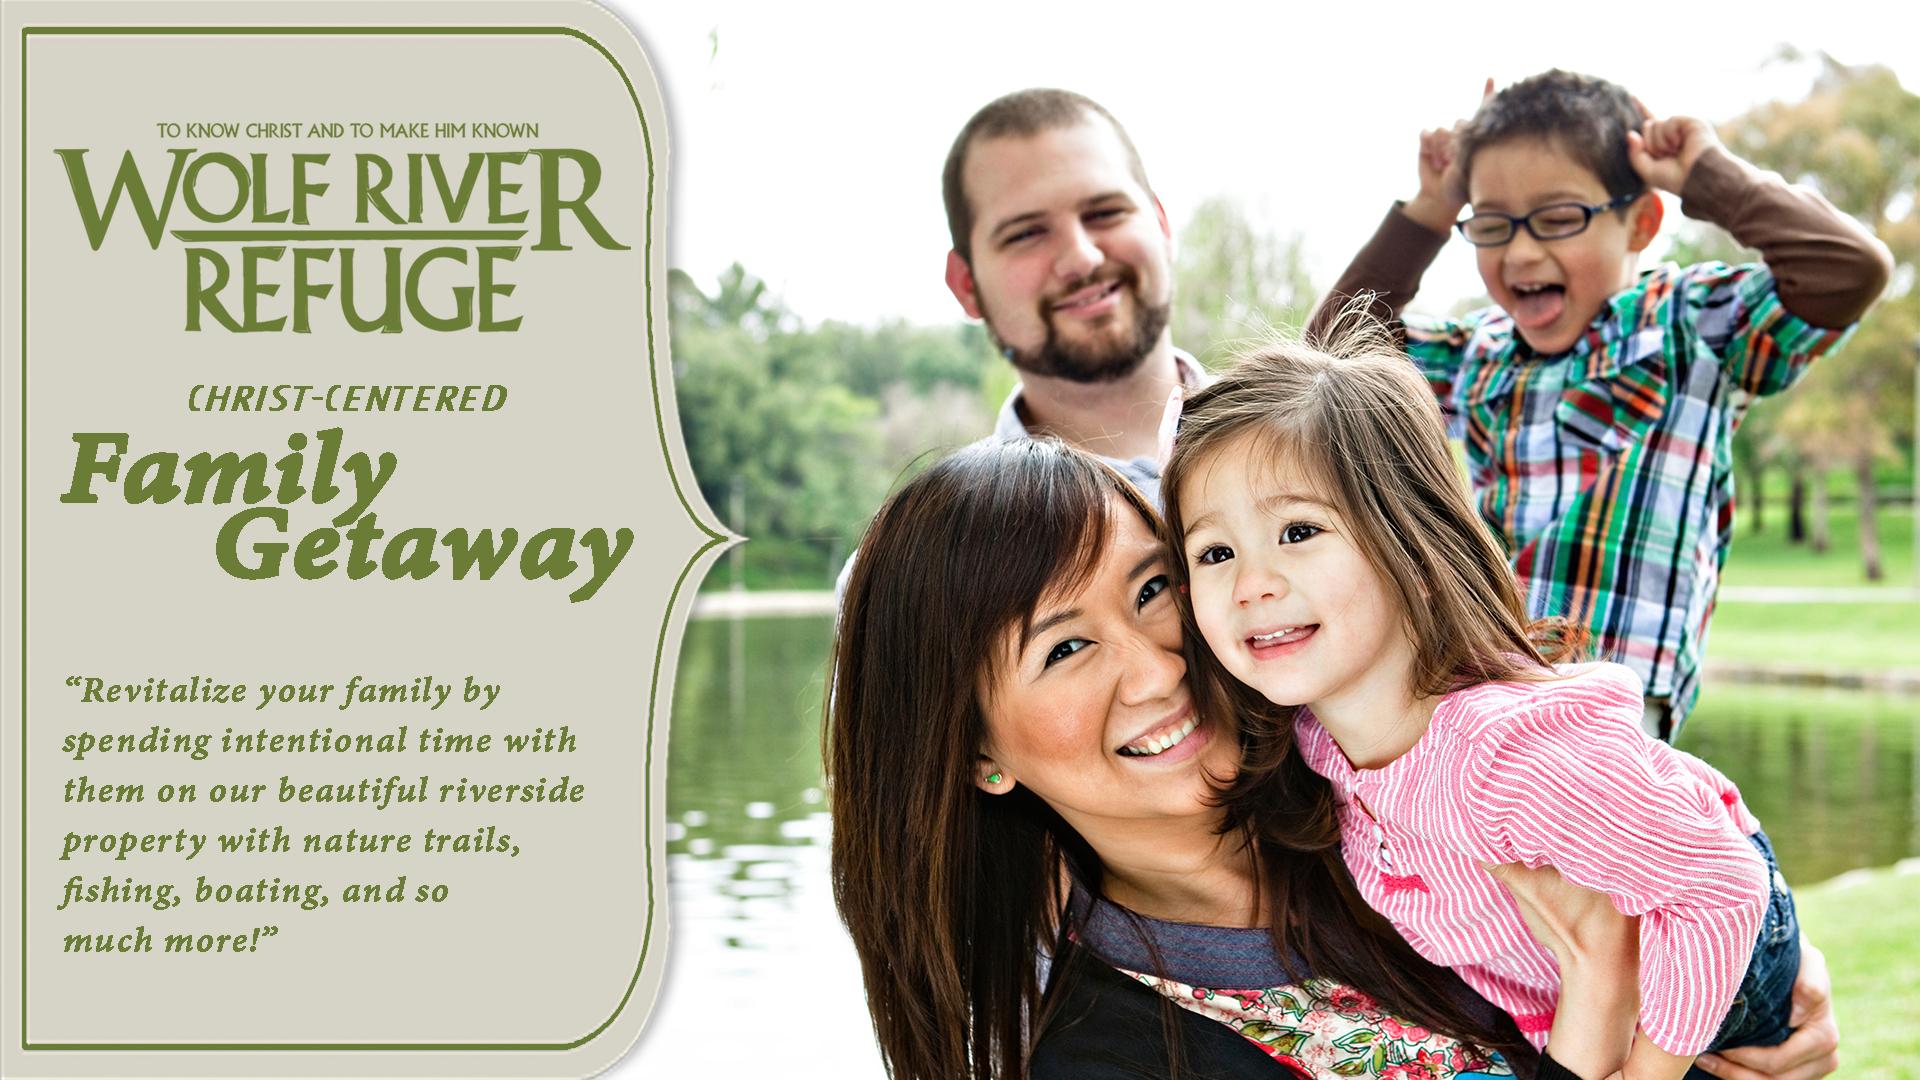 Family-Getaway-Foyer_Website-1.png